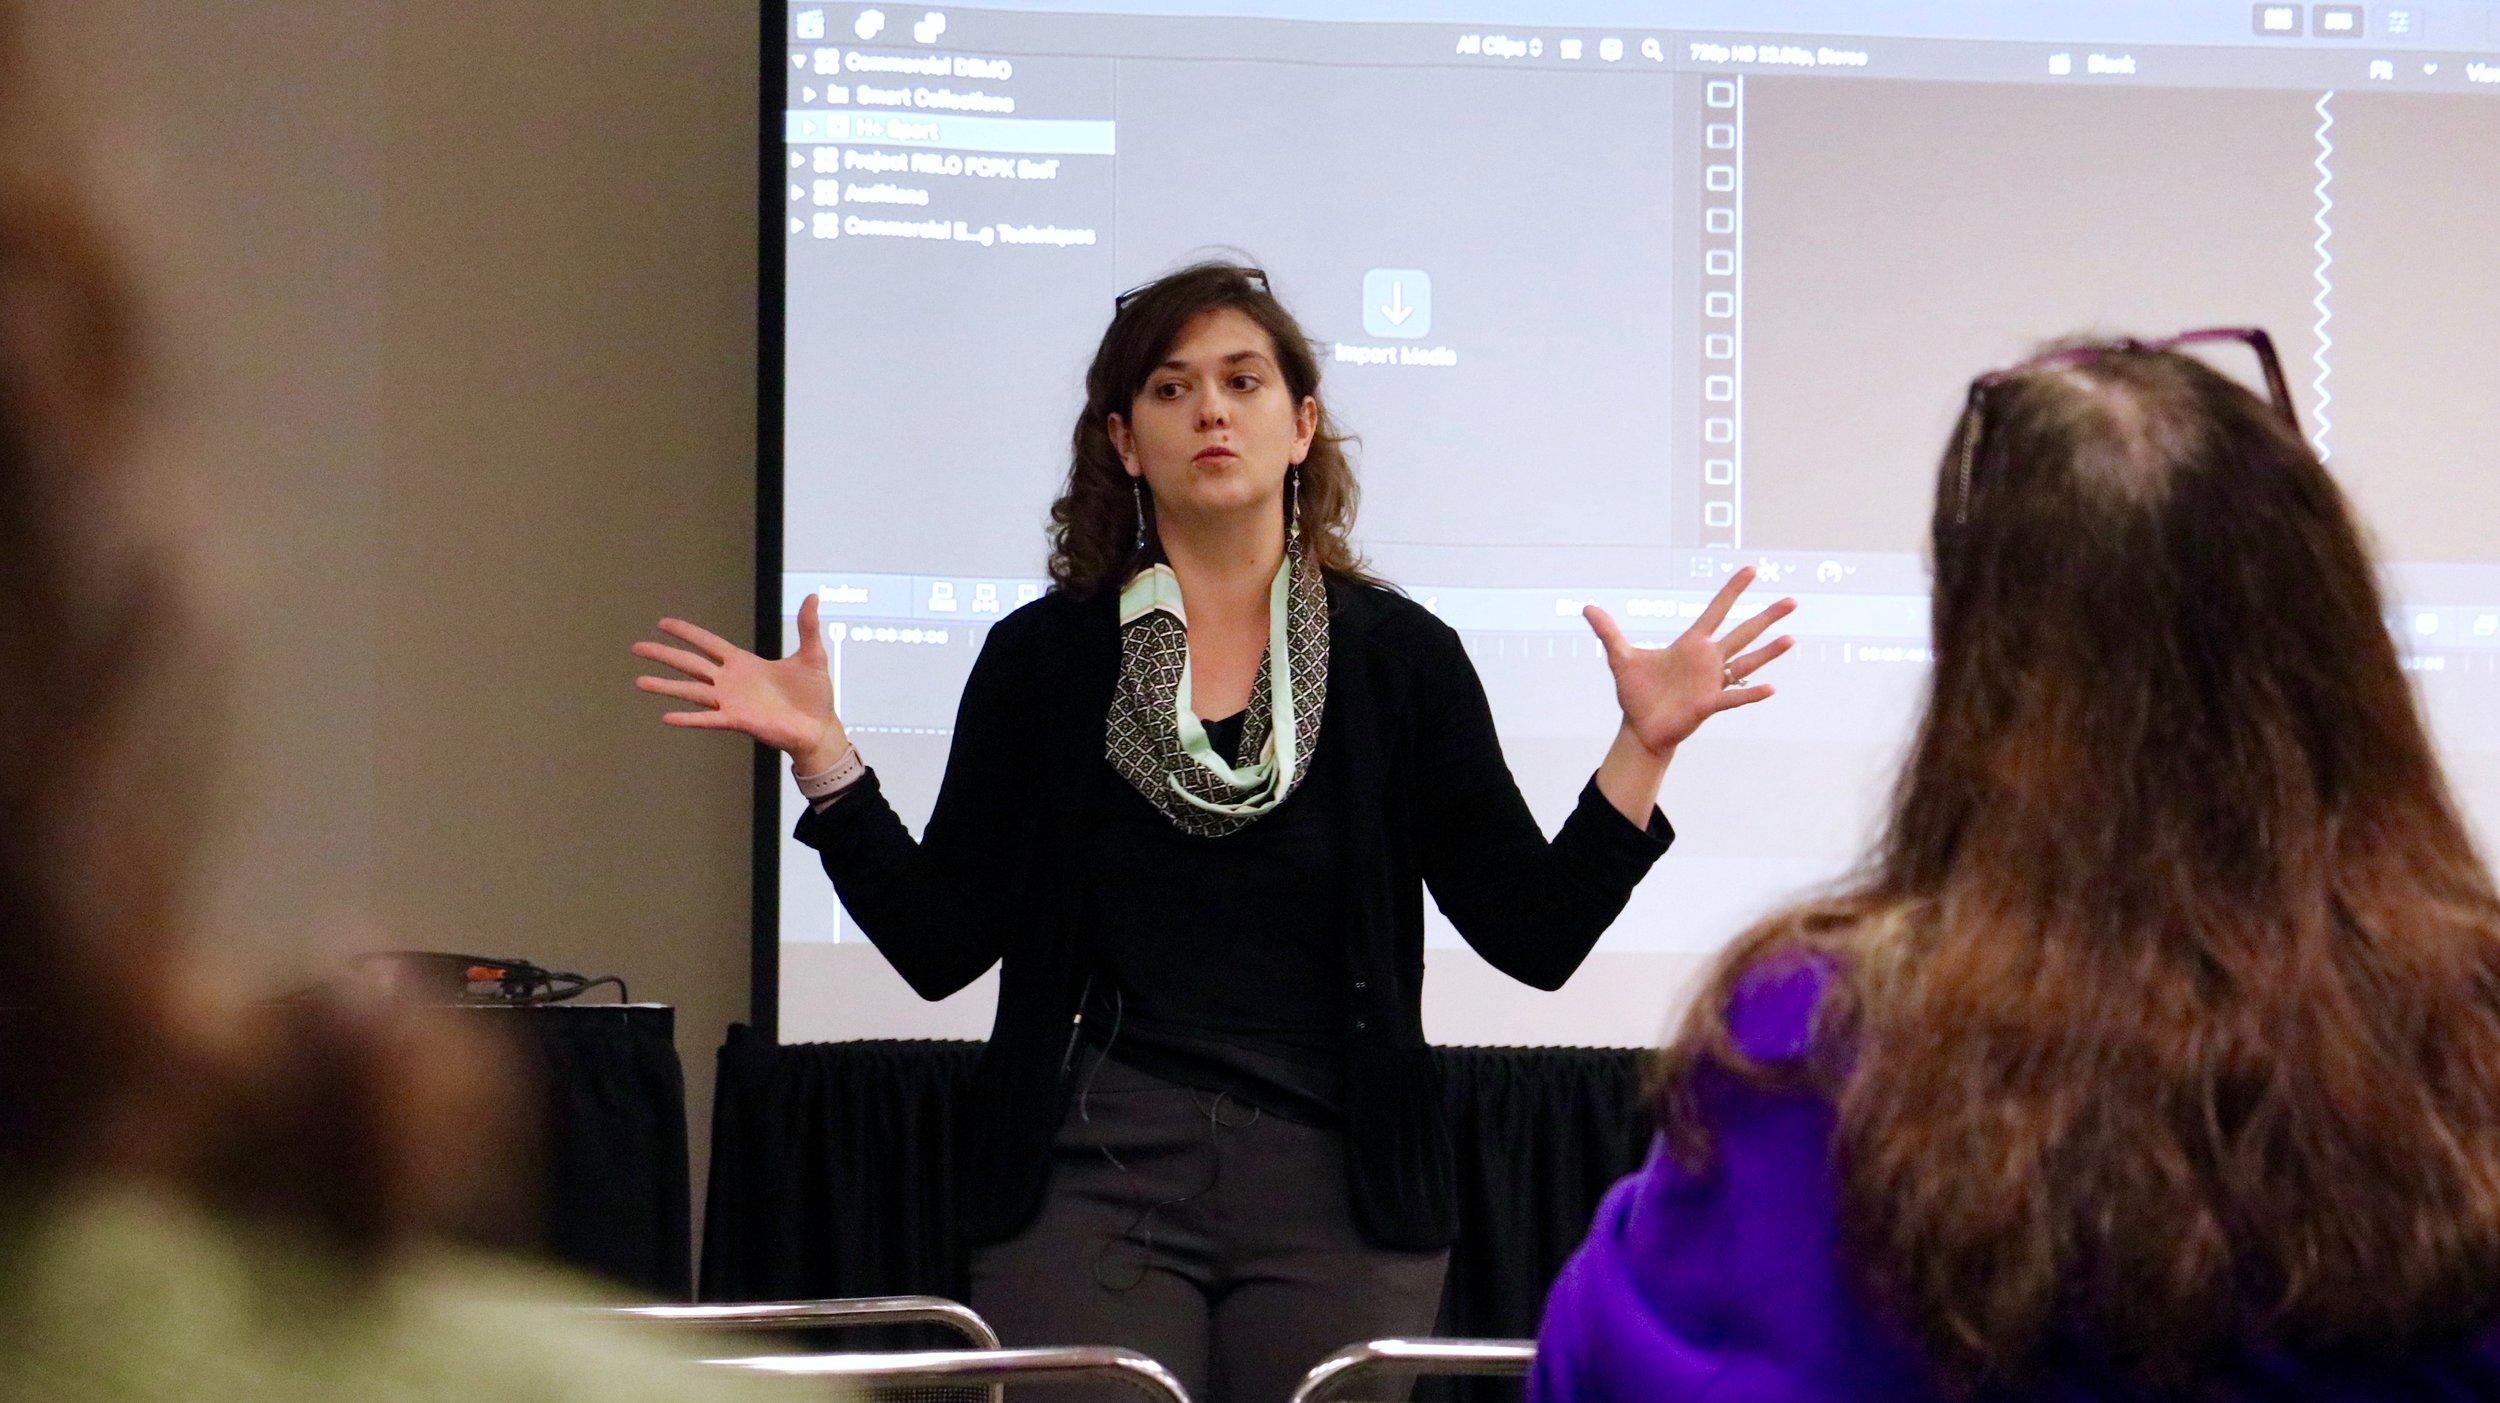 Ashley Kennedy , NY Post|Production Conference, NAB Show NY 2016. Photo by Paul Murphy.